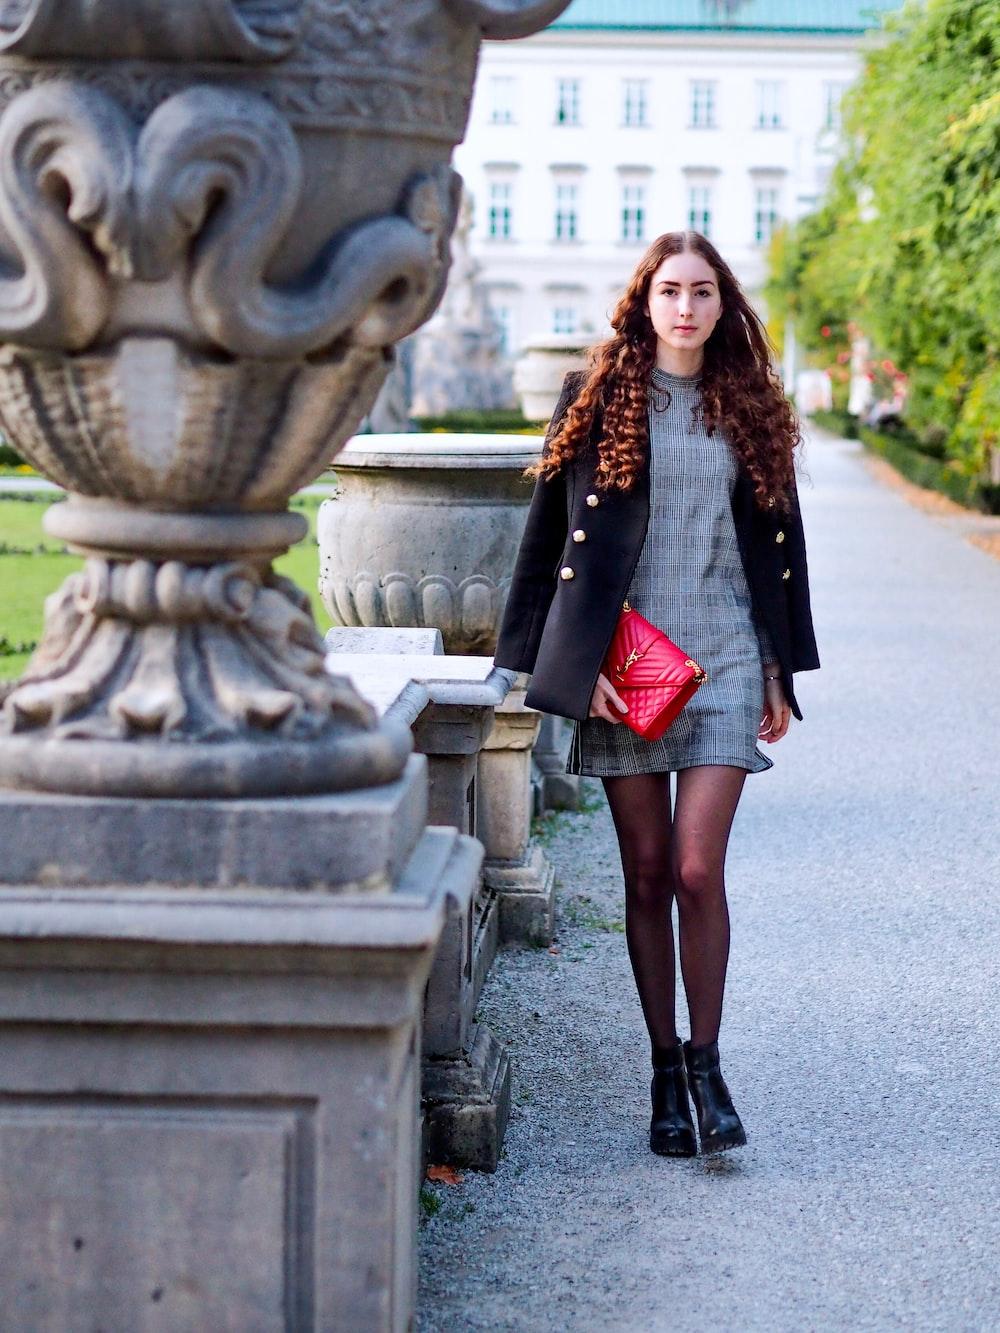 woman walking wearing black coat